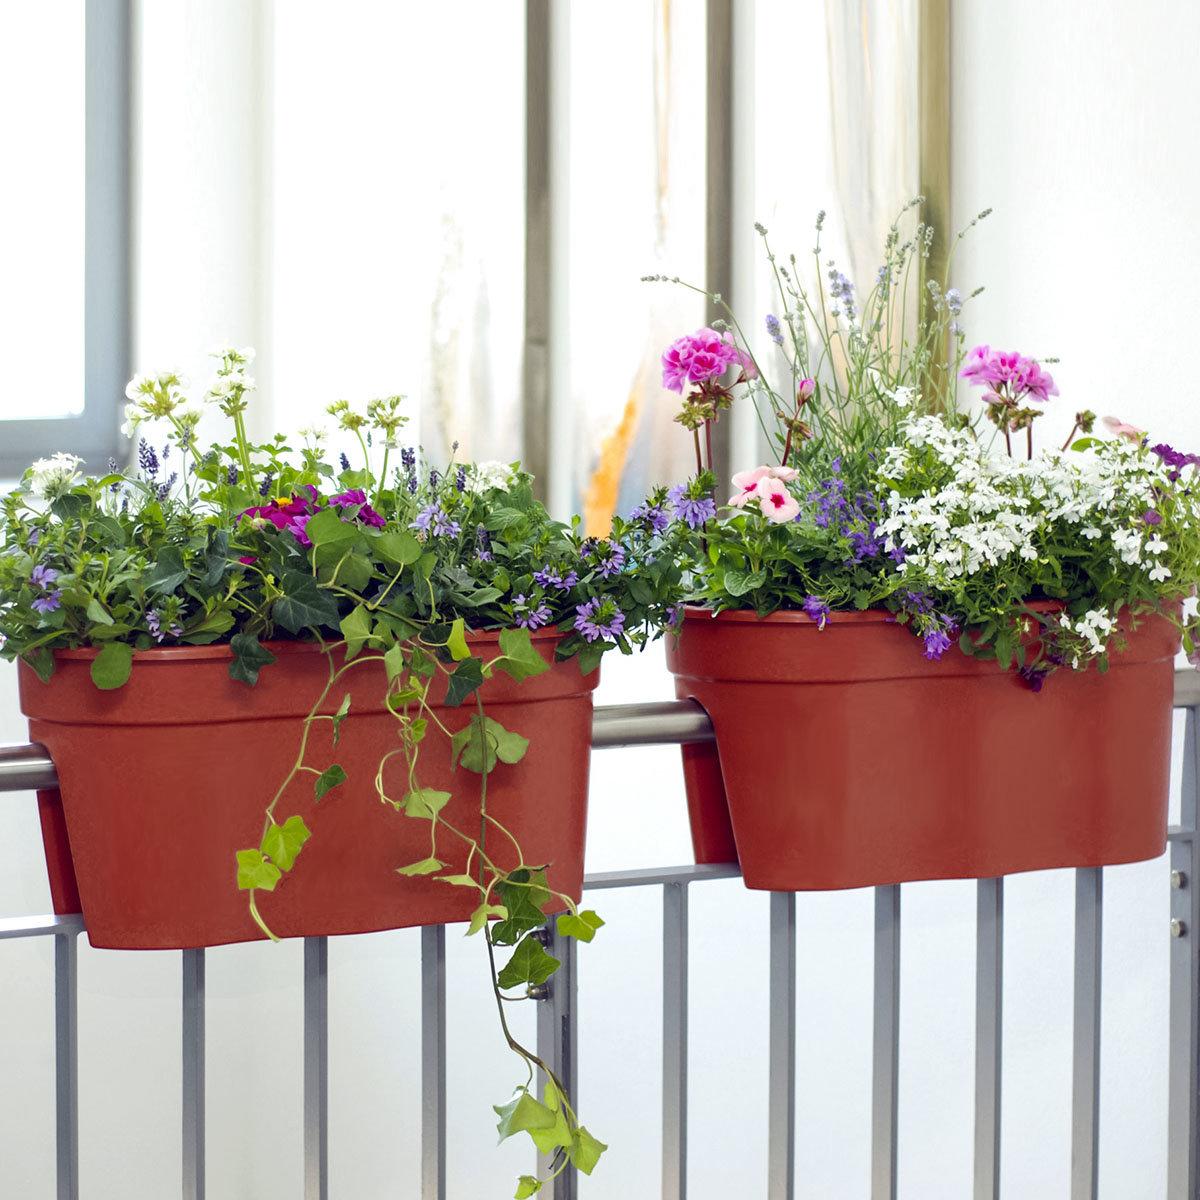 Geländertopf Flowerclip, 57,5 x 27,7 x 27 cm, terracotta | #2